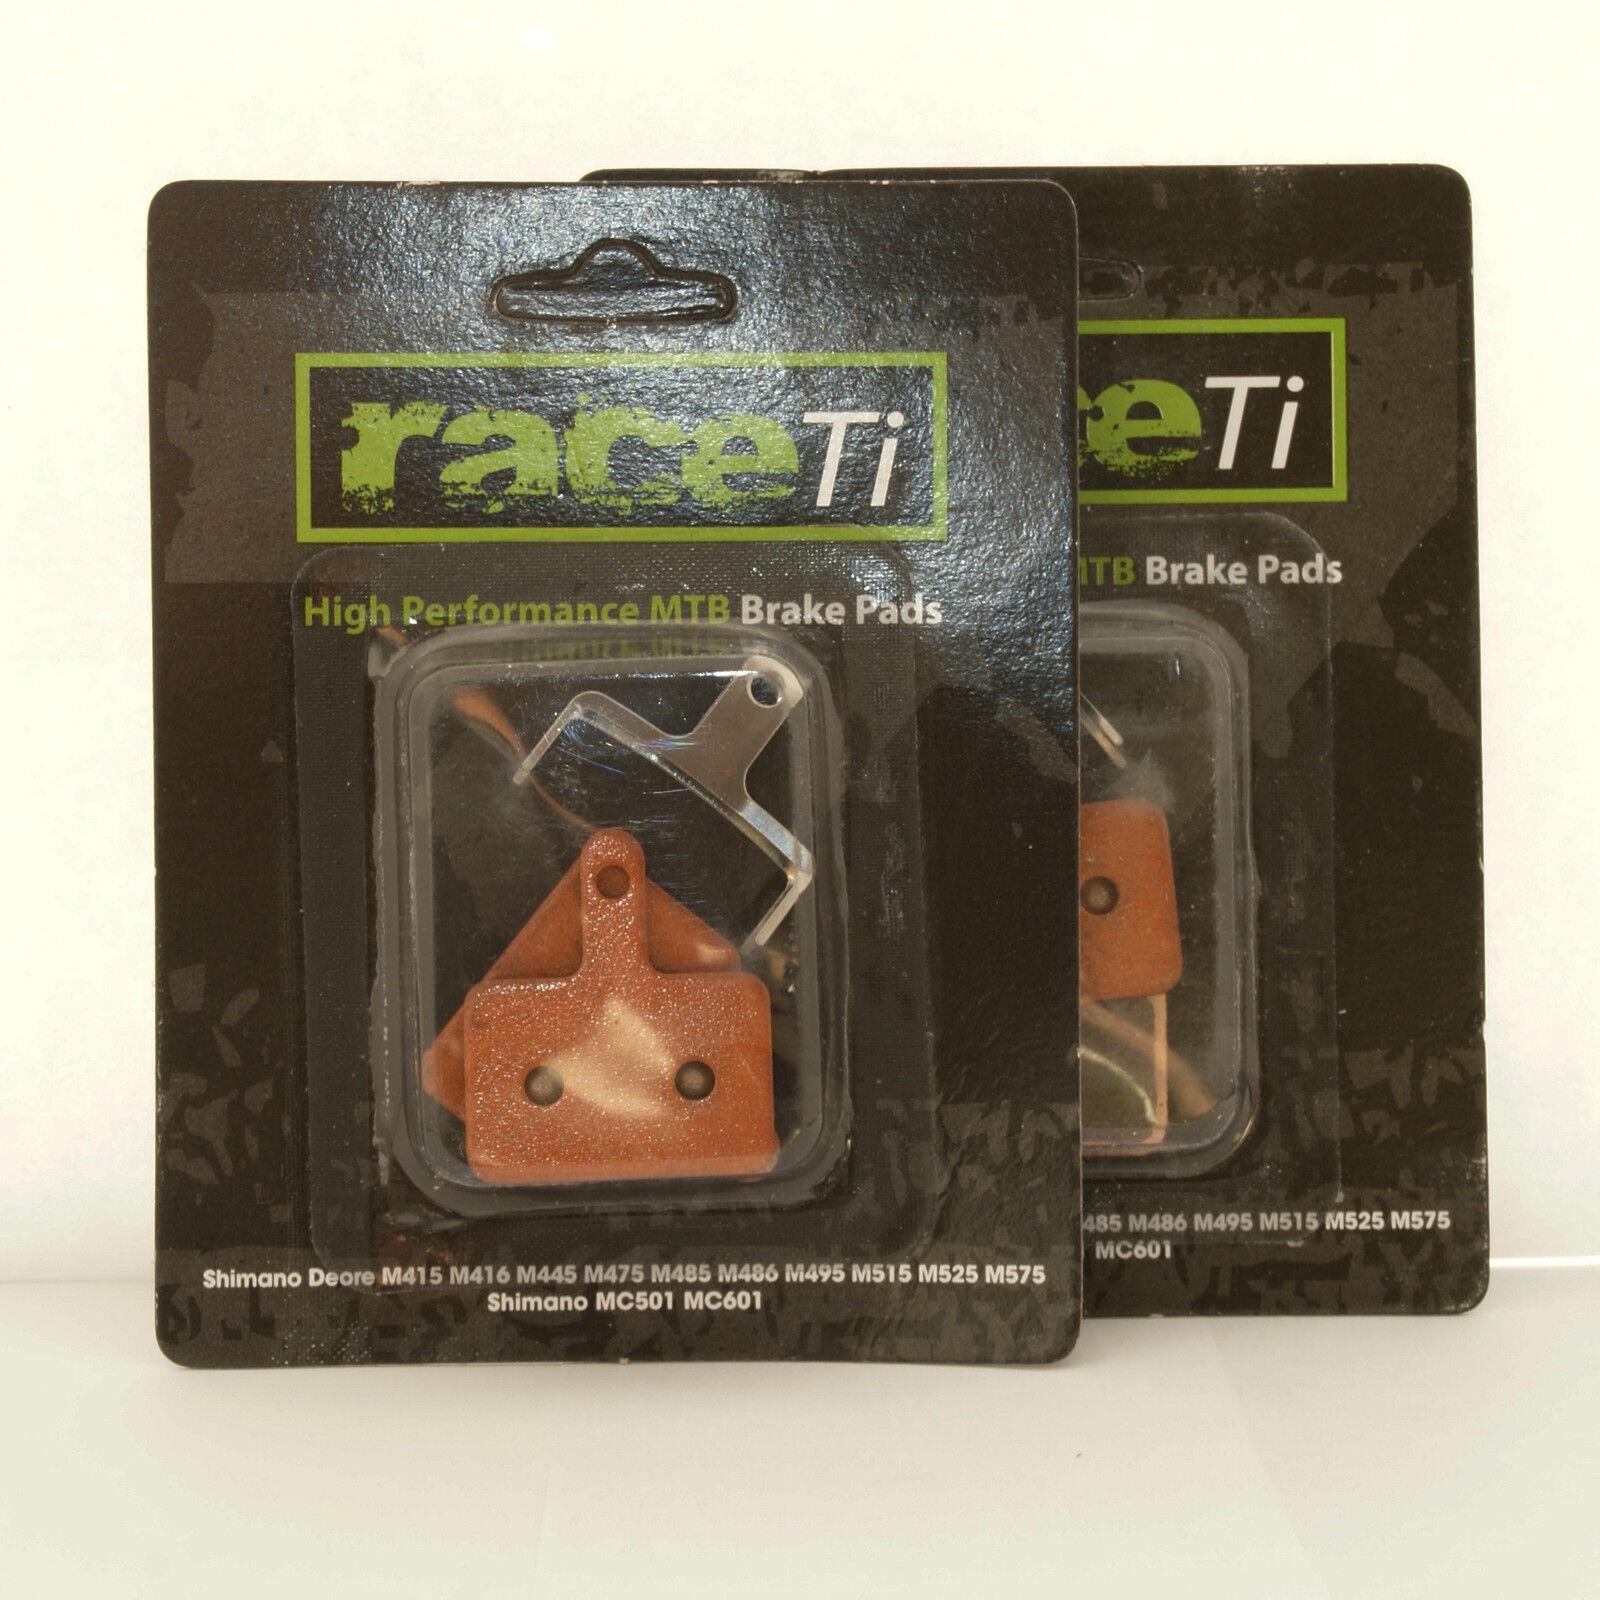 Shimano frein plaquettes de frein Shimano Fritté deore disc 515 525 486 485 M475 416 446 445 tektro 1ce6de